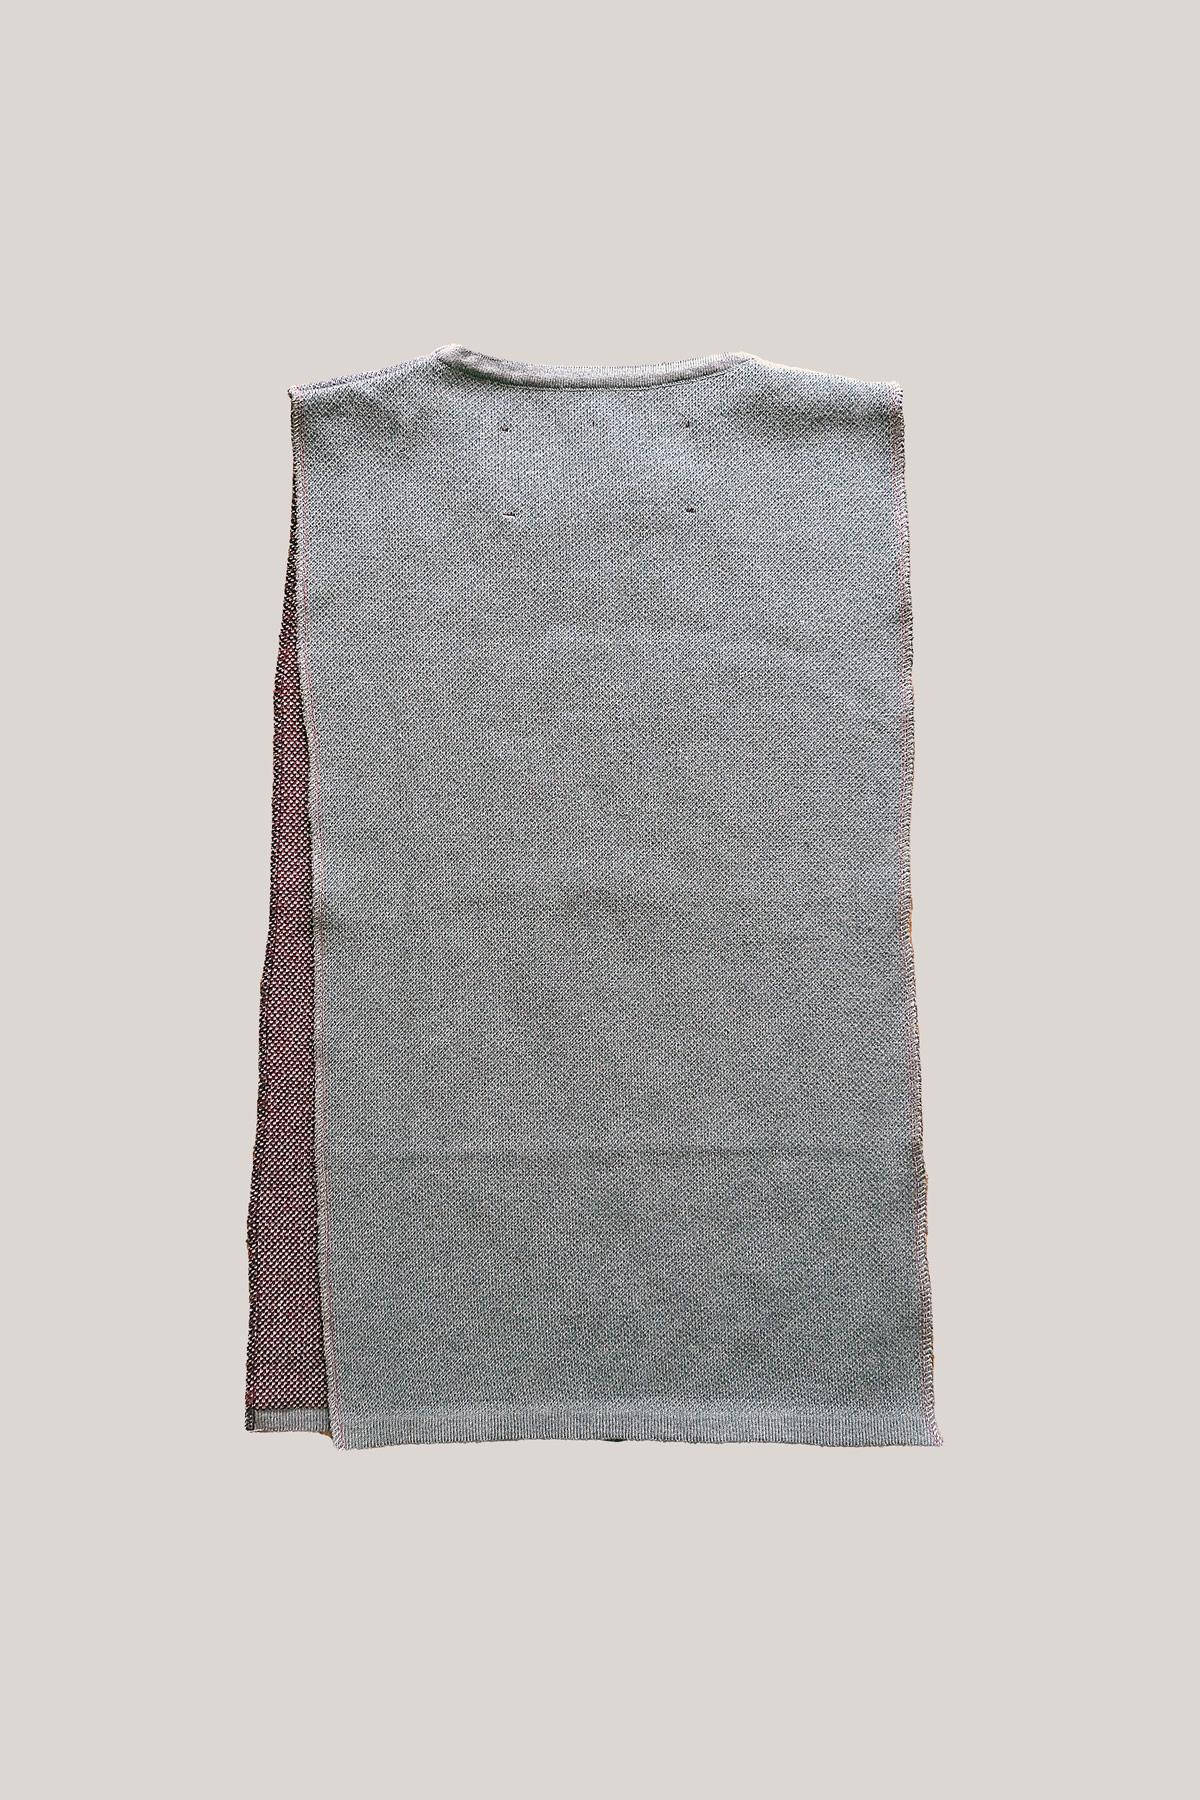 34-Love-Force-Vest-4